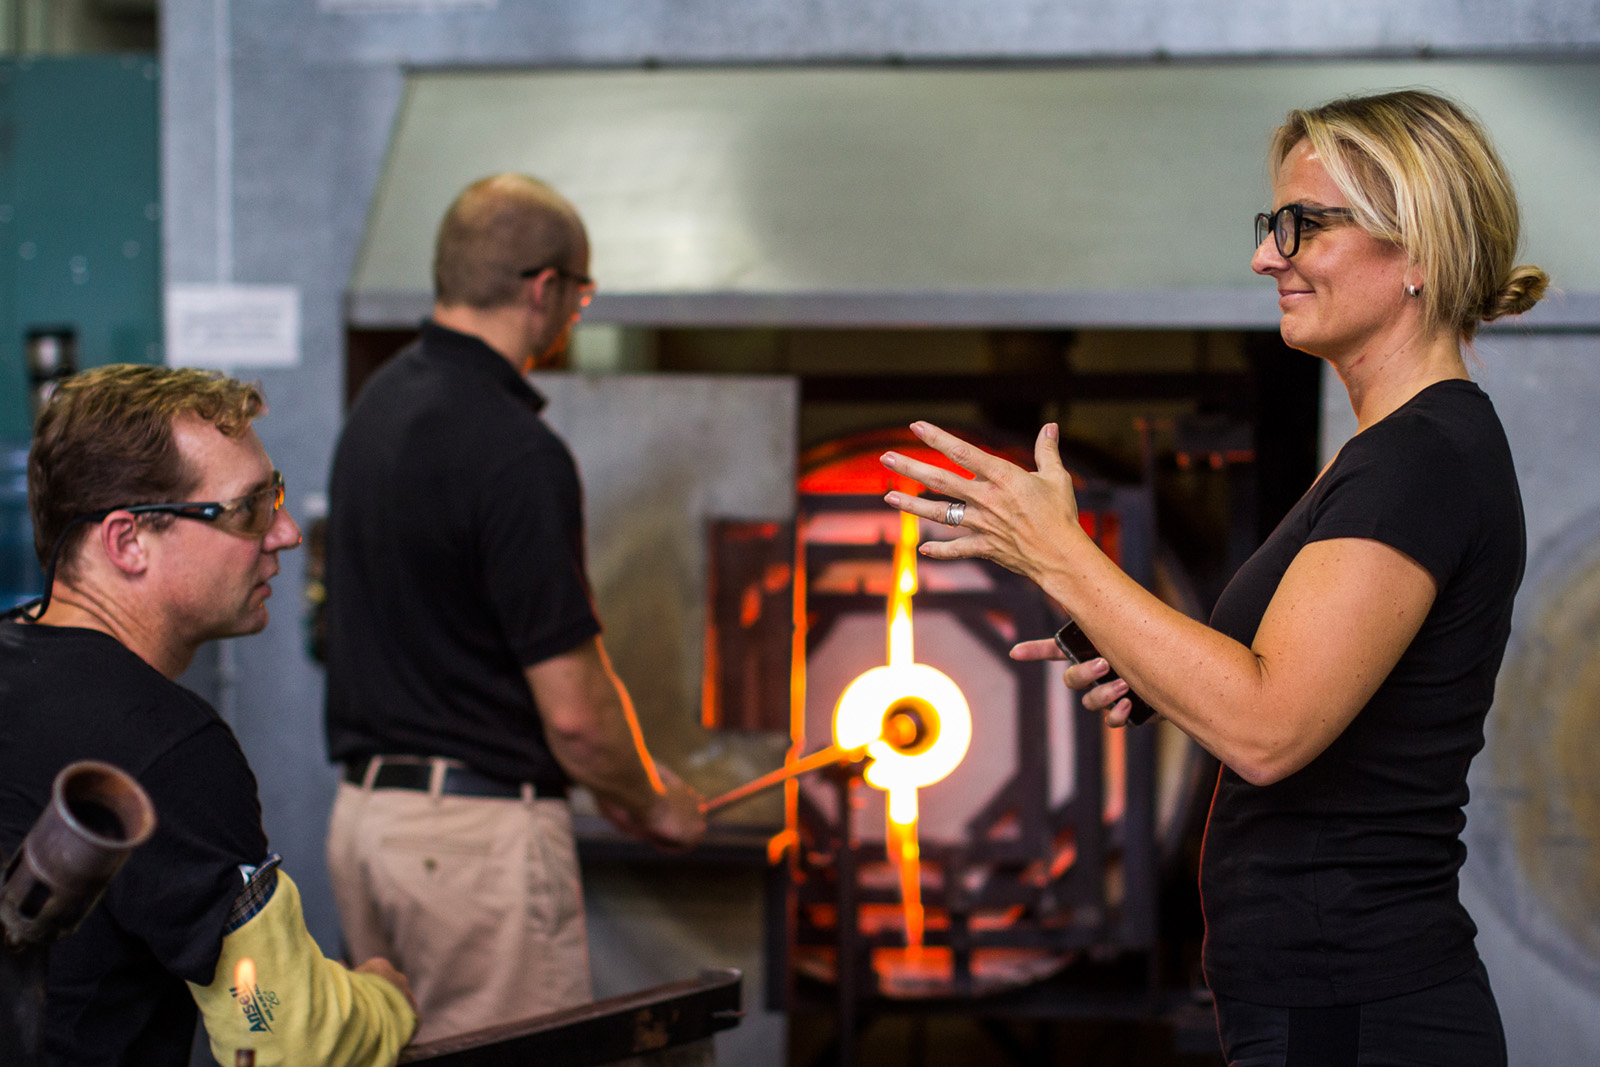 Designer Sigga Heimis in a GlassLab session in Corning, August 2013